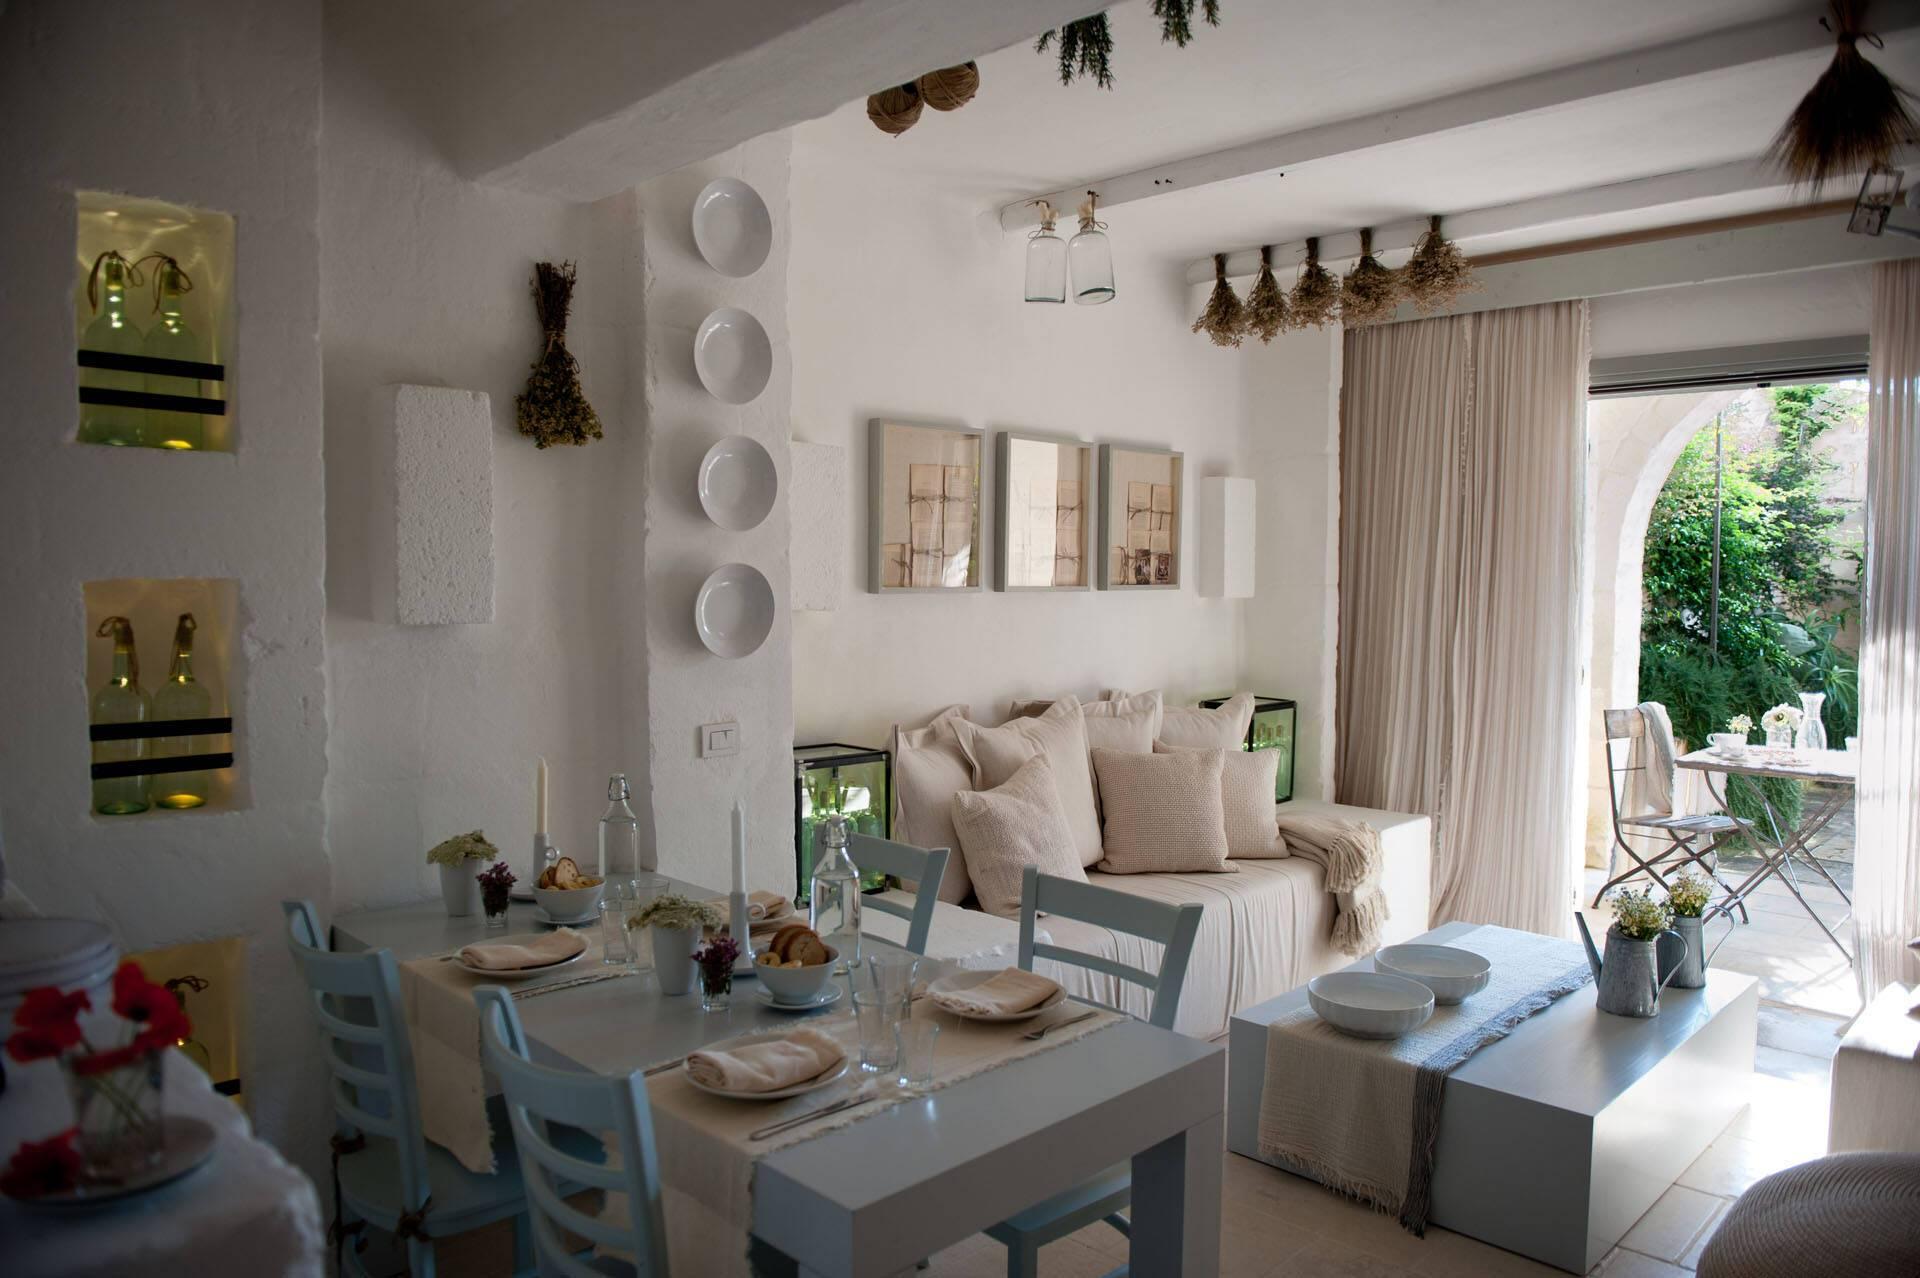 Borgo Egnazia Les Pouilles Casetta Magnifica Living room